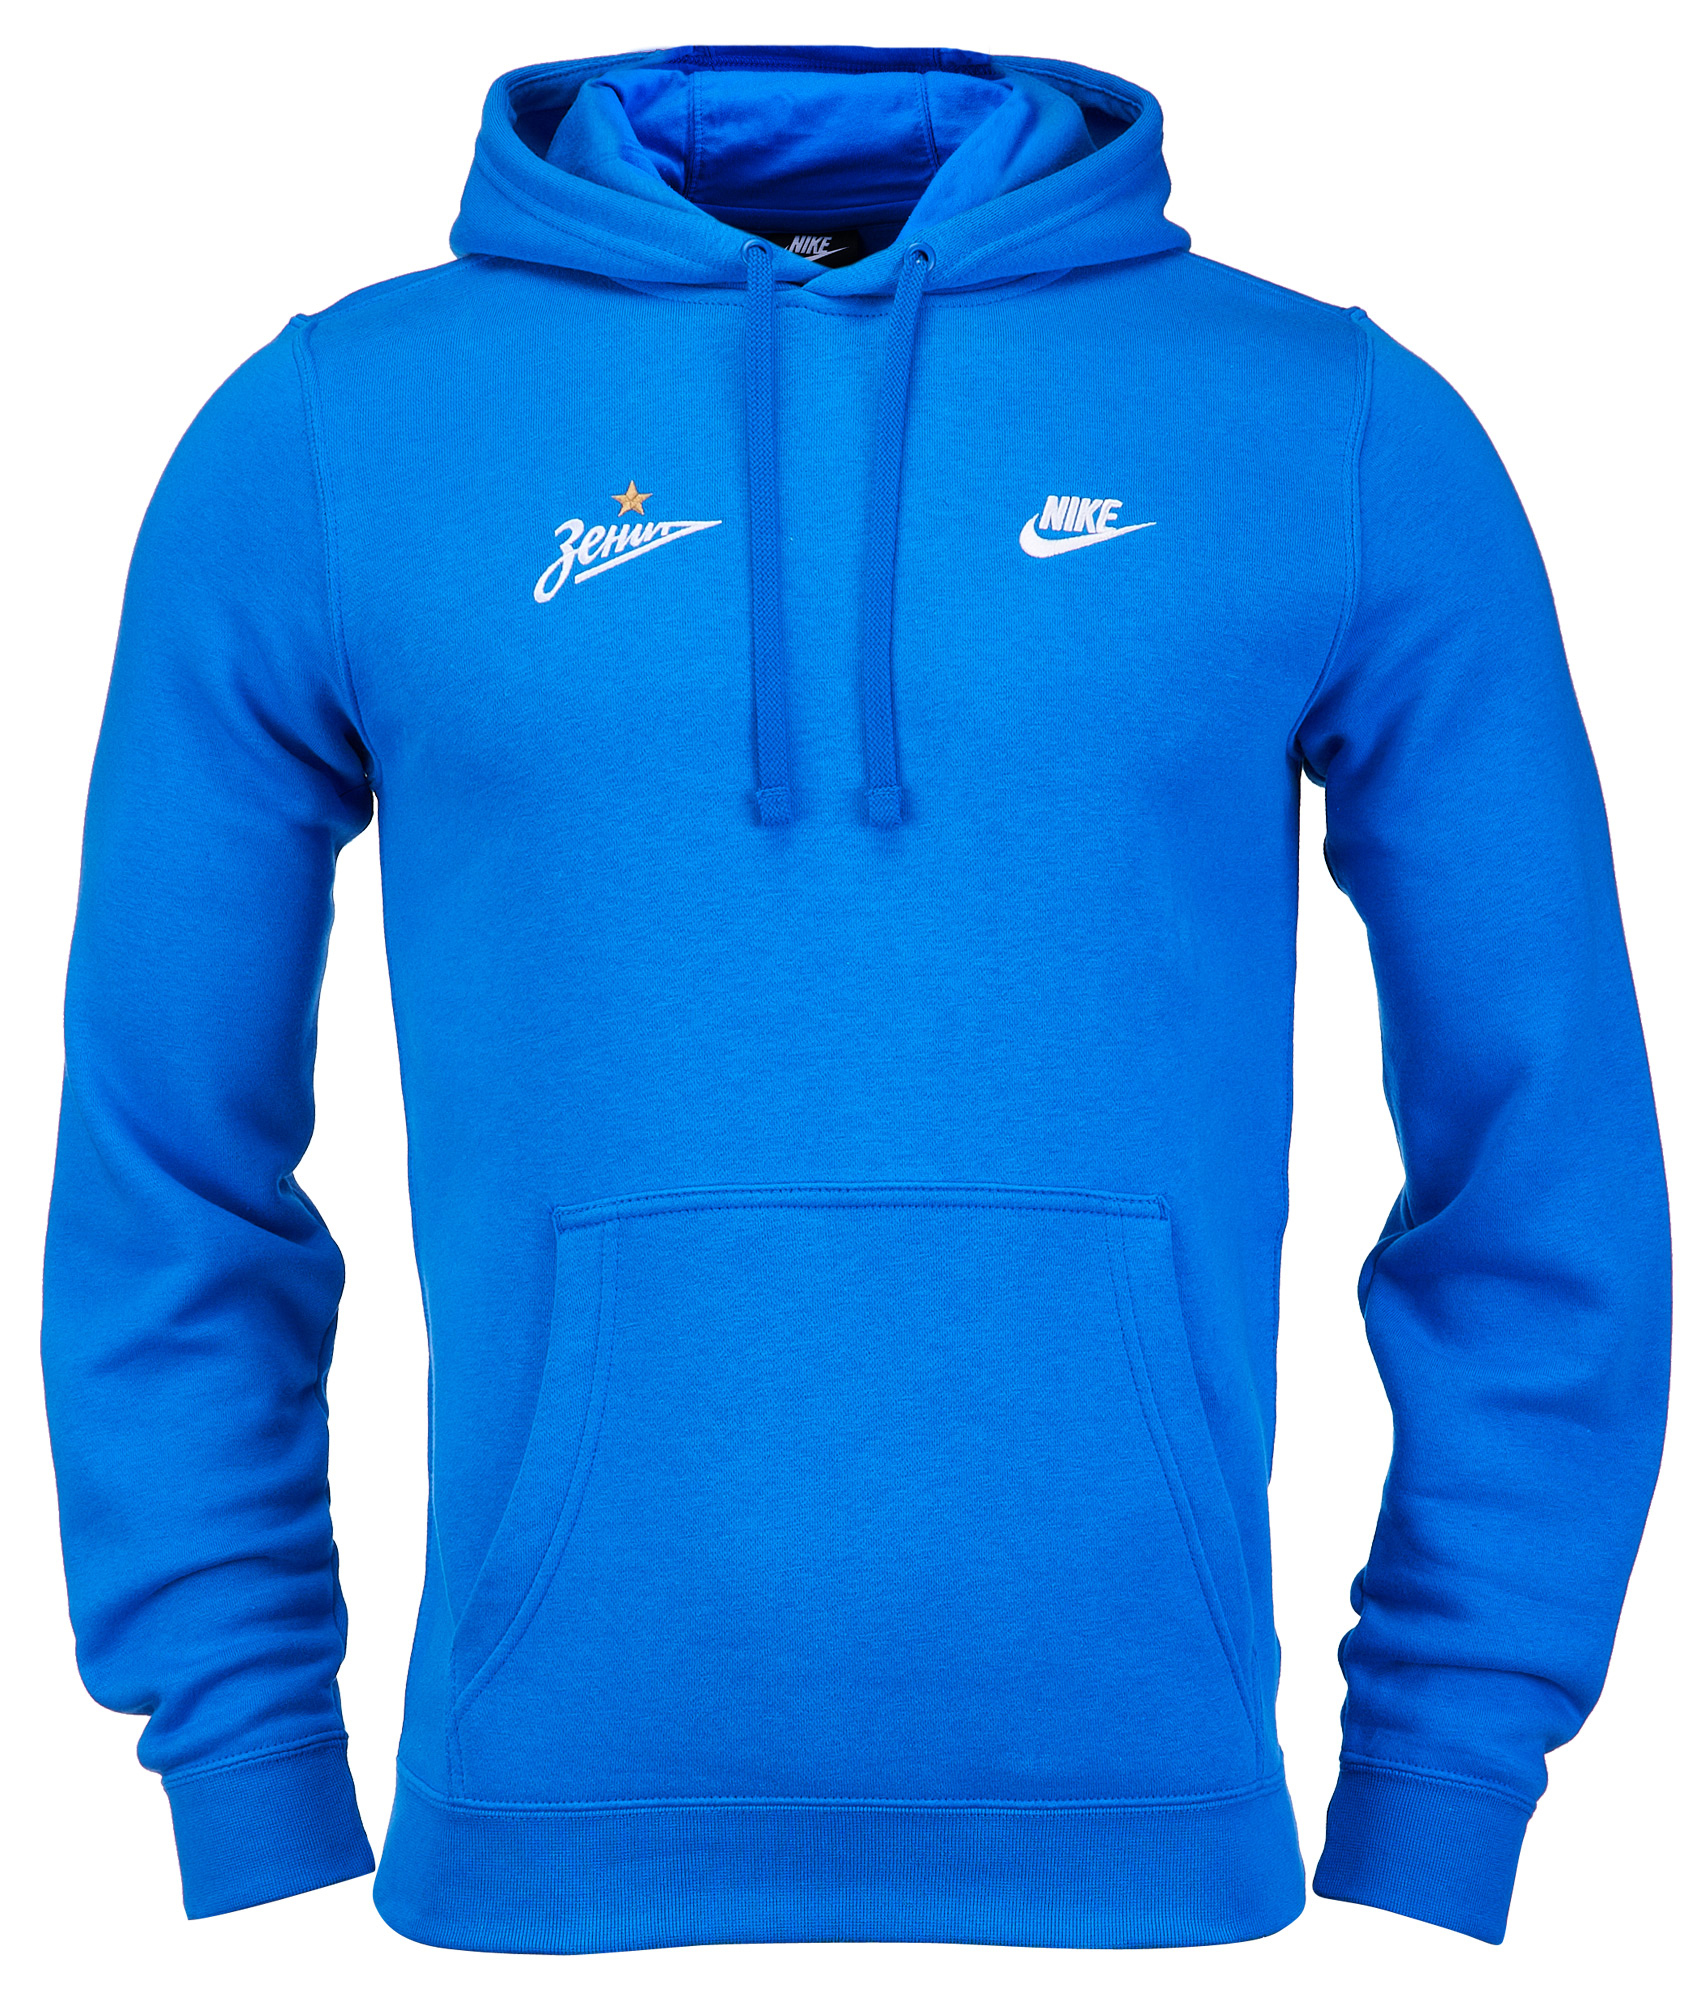 Толстовка мужская Nike Nike Цвет-Голубой